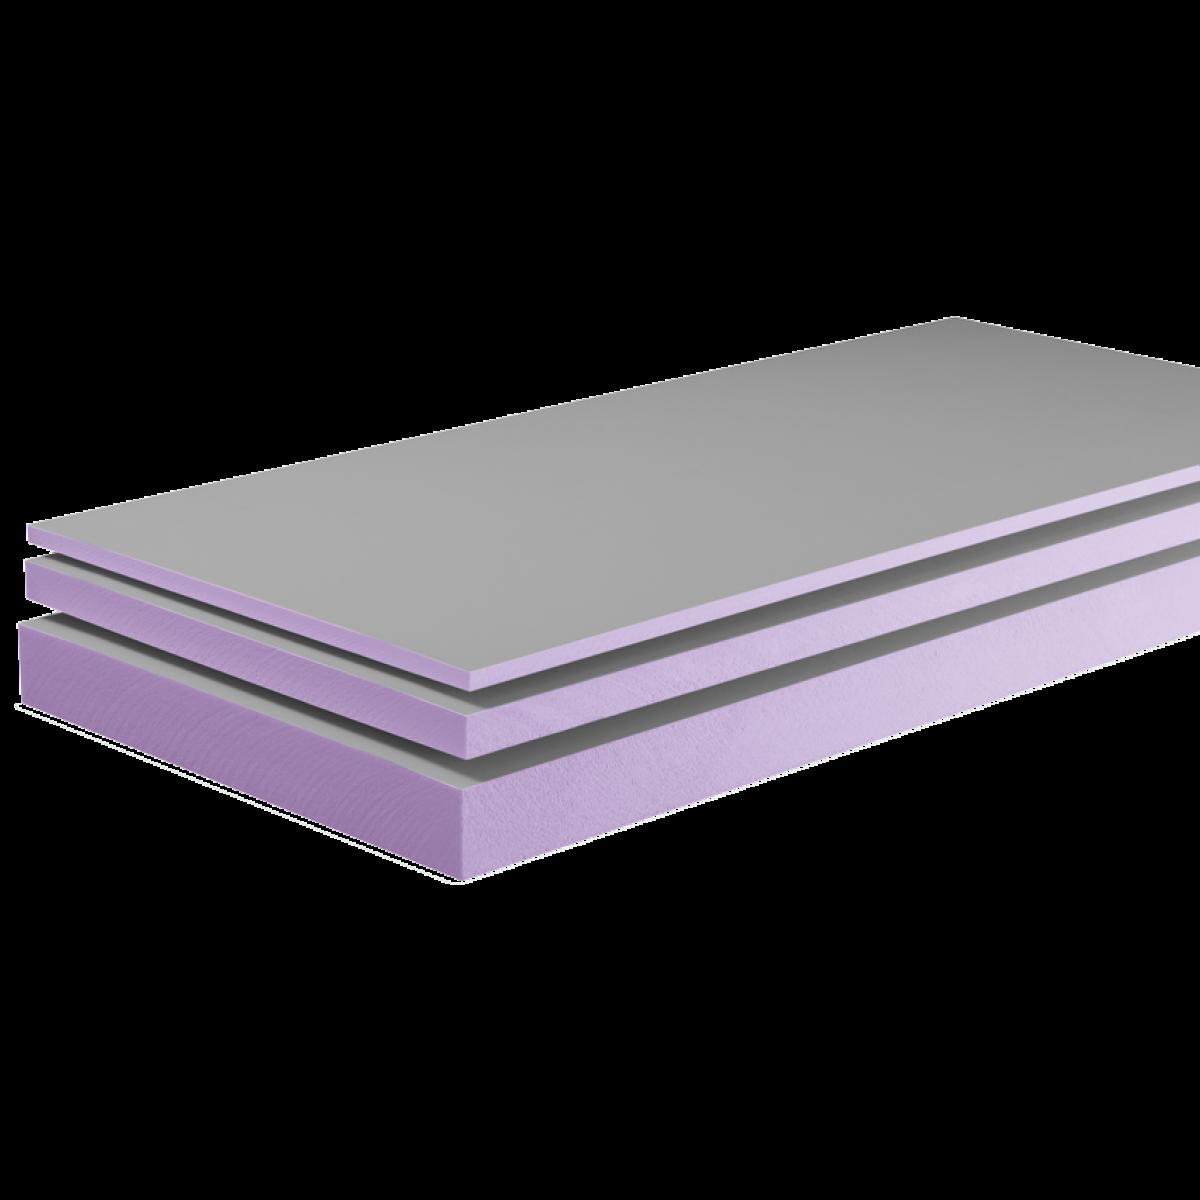 Systembauplatten 2600 x 600 x 50 mm / HBCD-frei